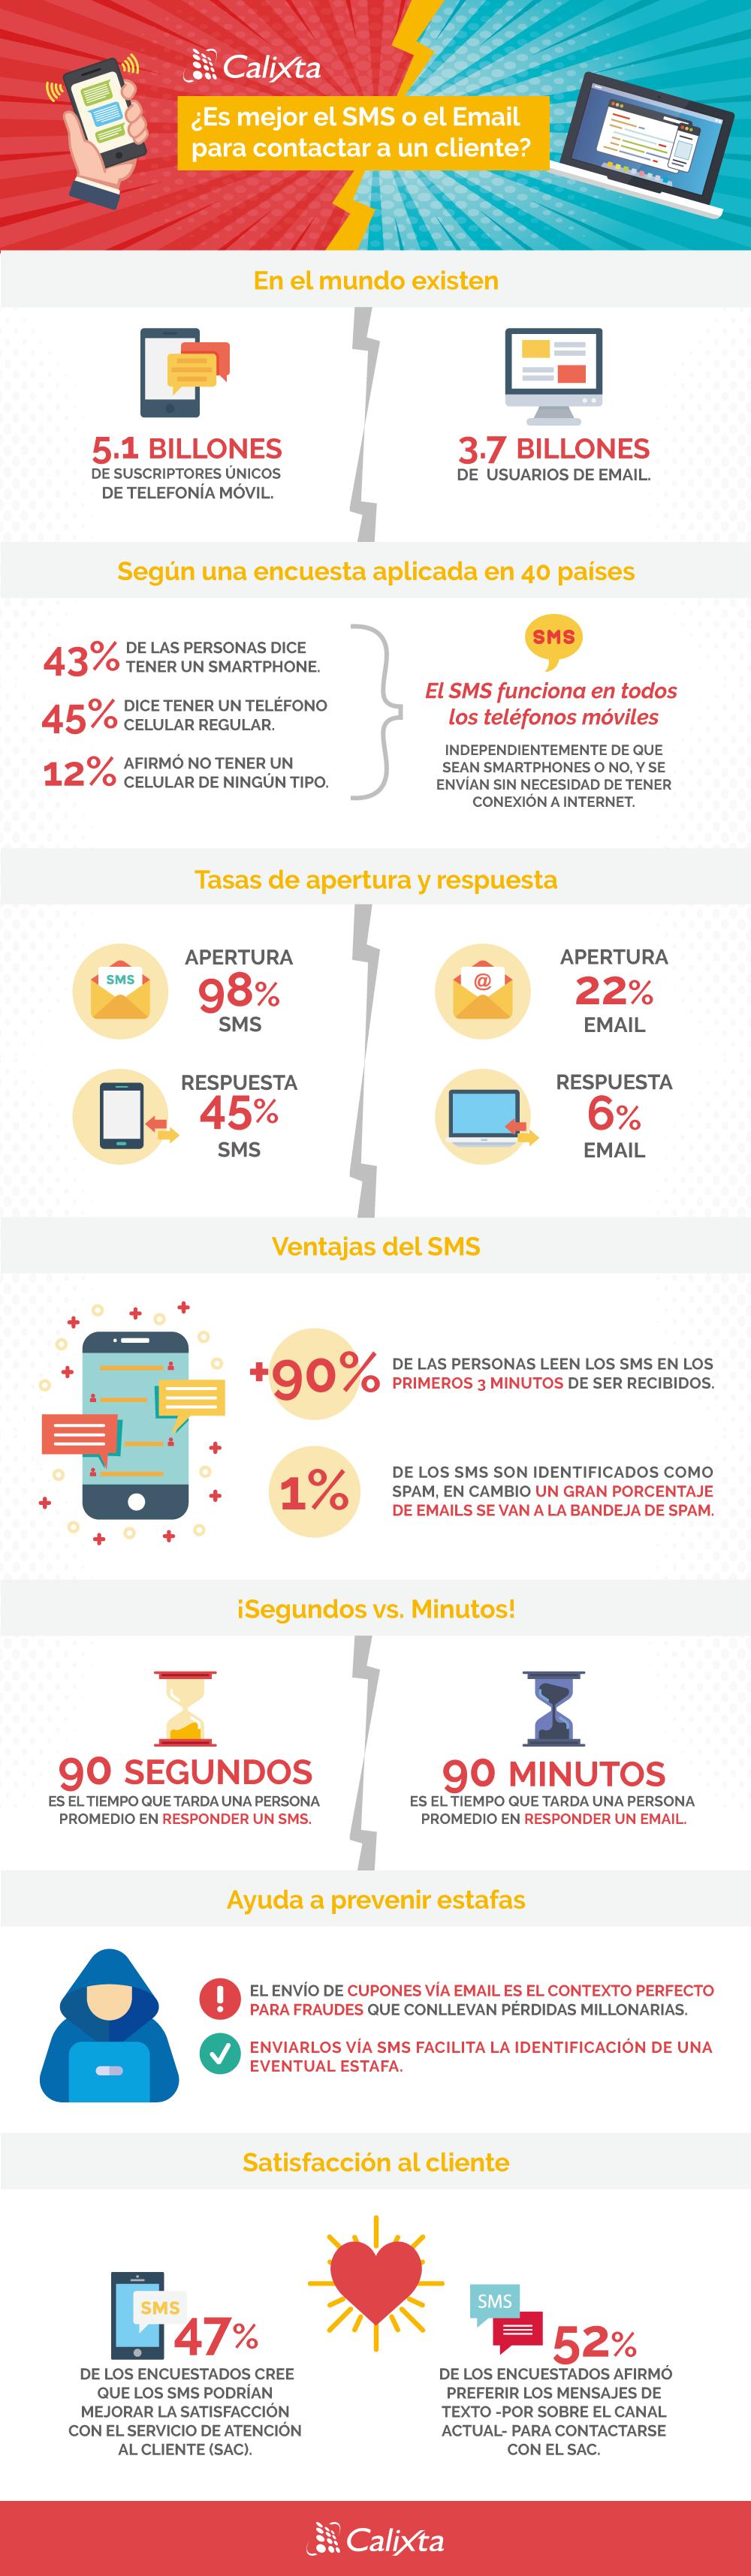 SMS vs Email, ¿cuál usar para tu siguiente campaña de contacto al cliente? - infografía